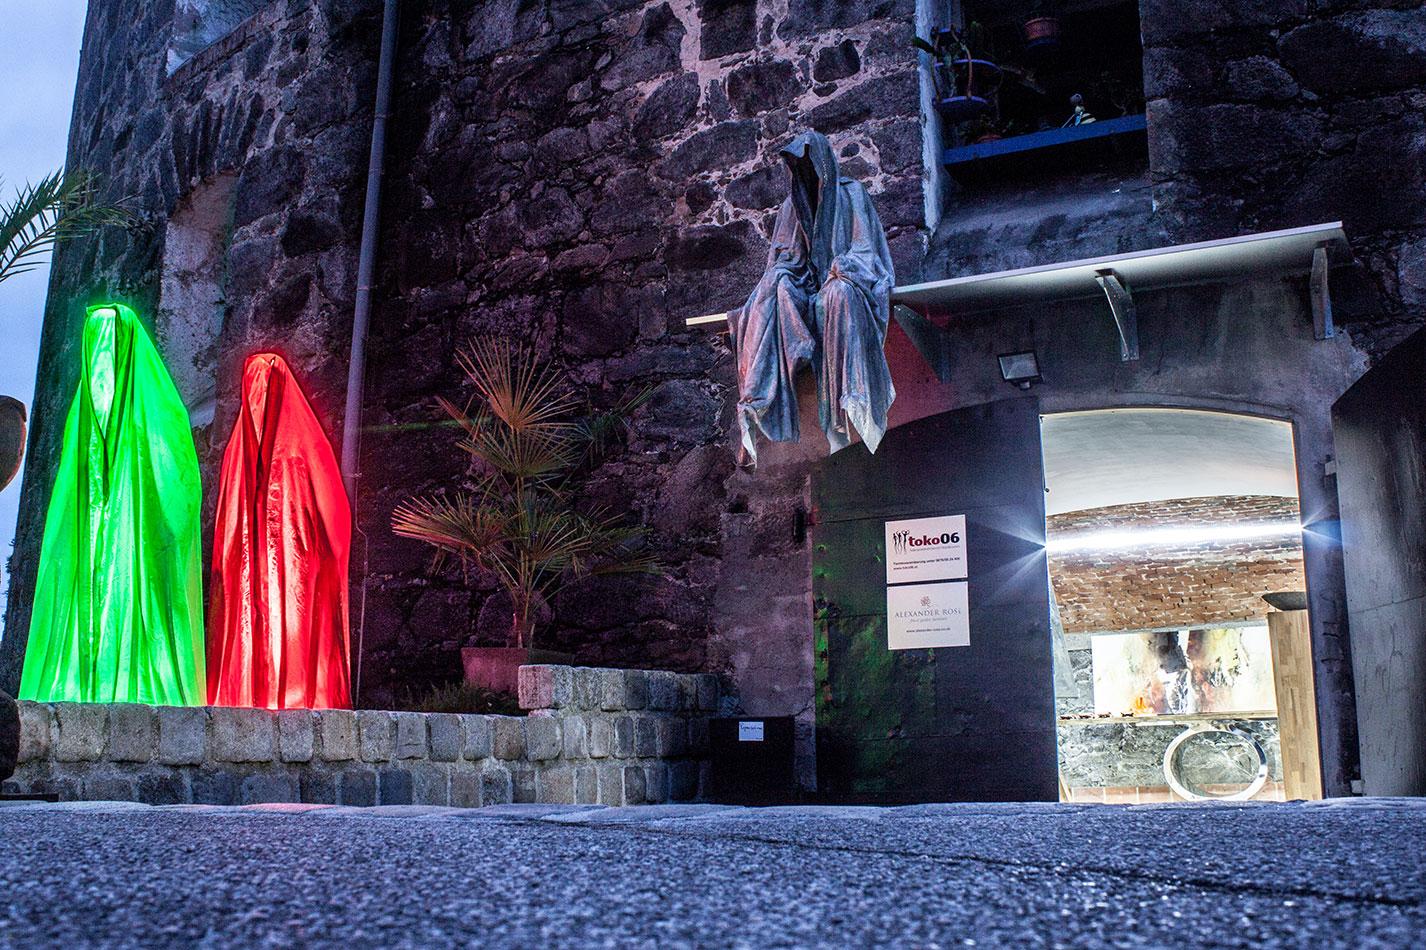 mobile-galerie-gall-toko06-linz-25er-turm-guardians-of-time-manfred-kielnhofer-contemporary-fine-art-design-sculpture-2645